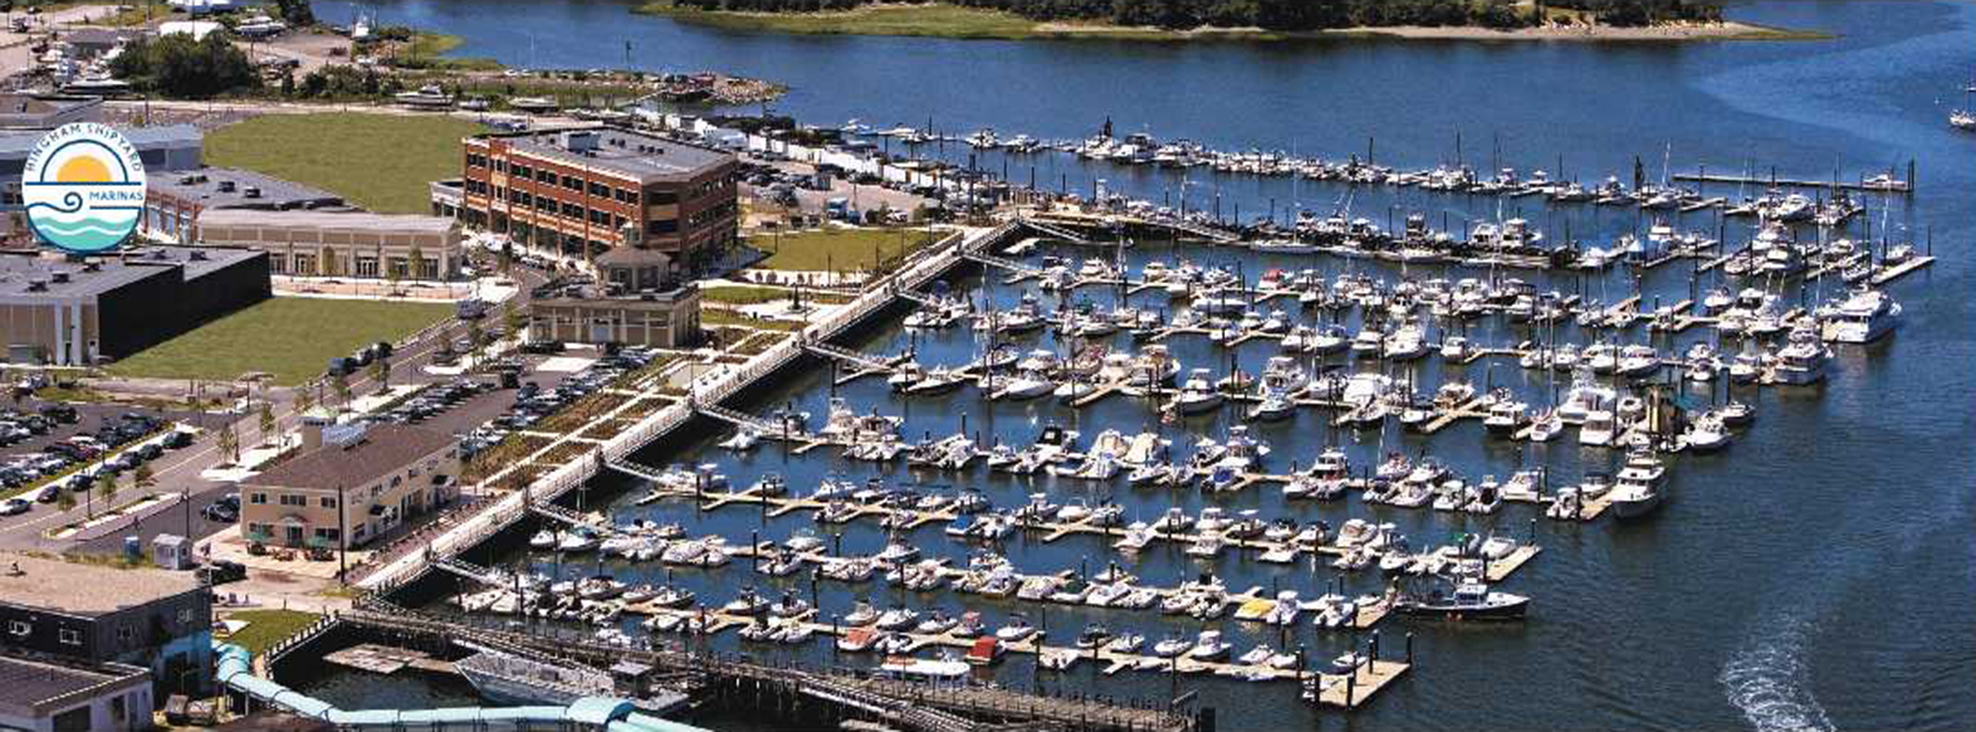 Hingham Shipyard Marinas in Hingham, MA